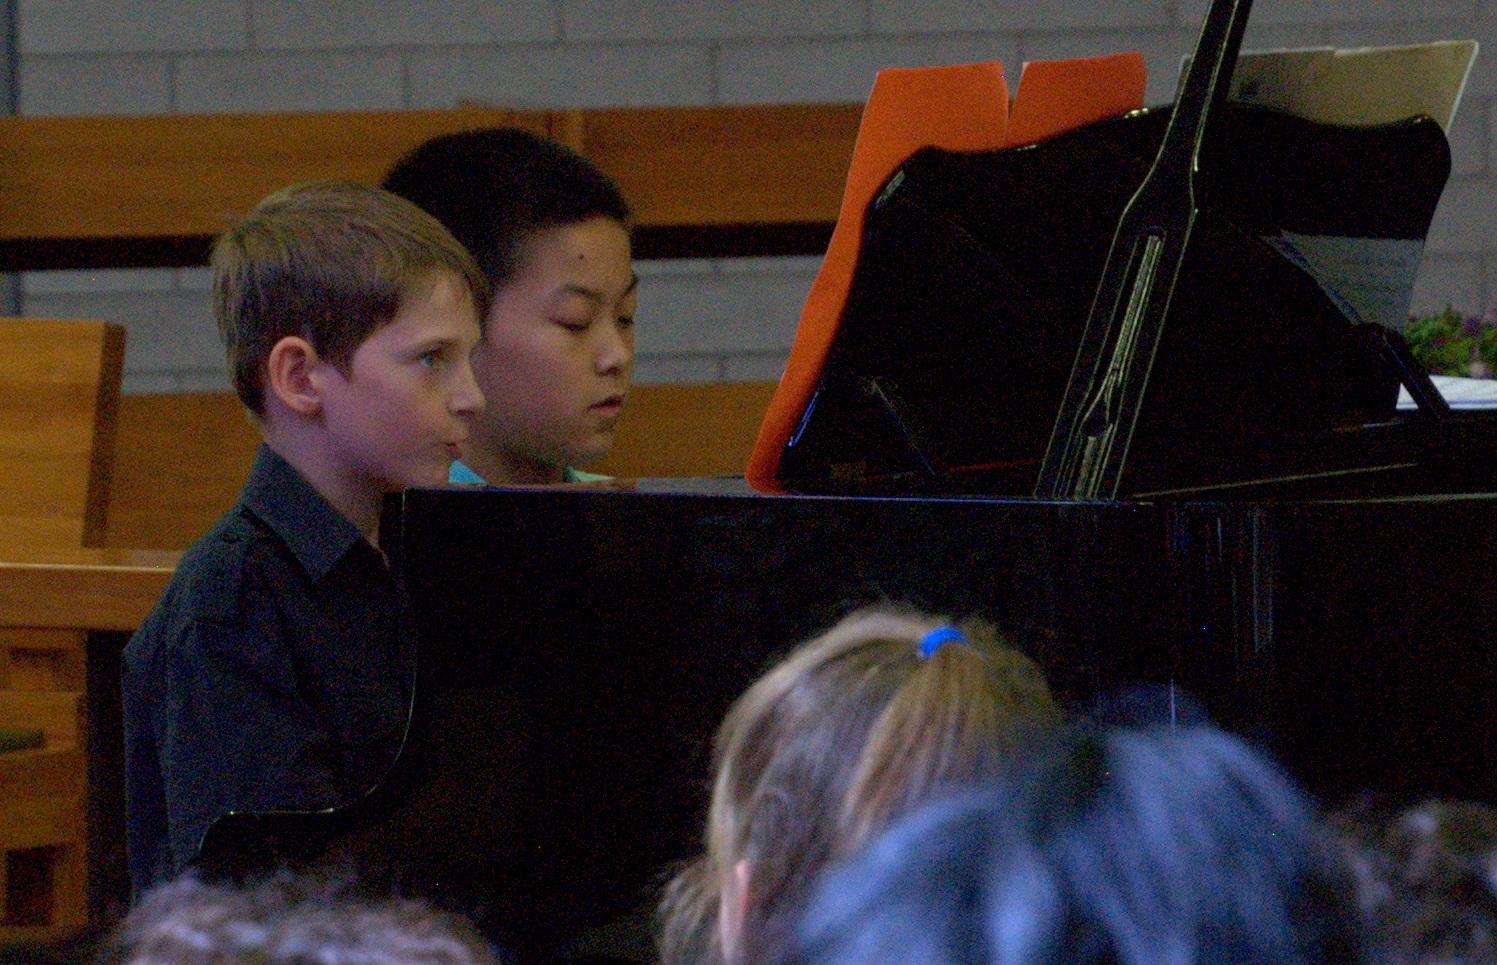 x_Piano_boys.jpg